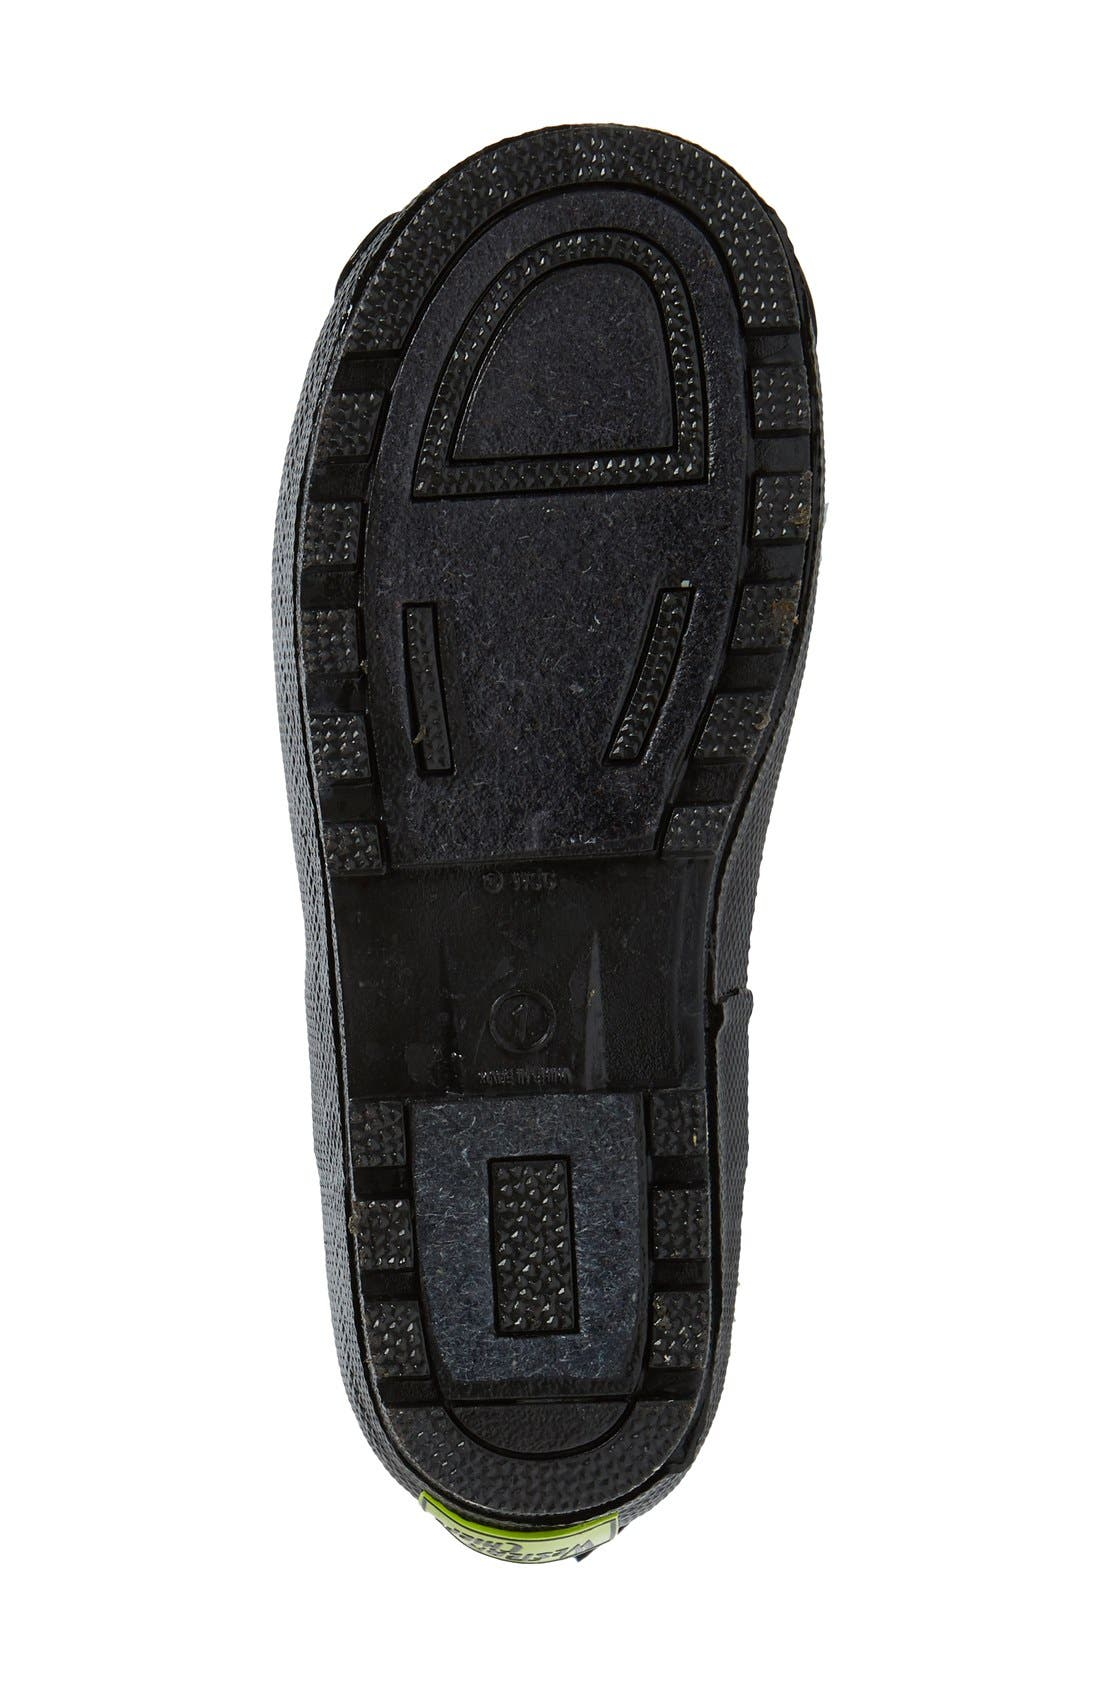 'Star Wars<sup>™</sup> - Darth Vader' Waterproof Rain Boot,                             Alternate thumbnail 4, color,                             Black